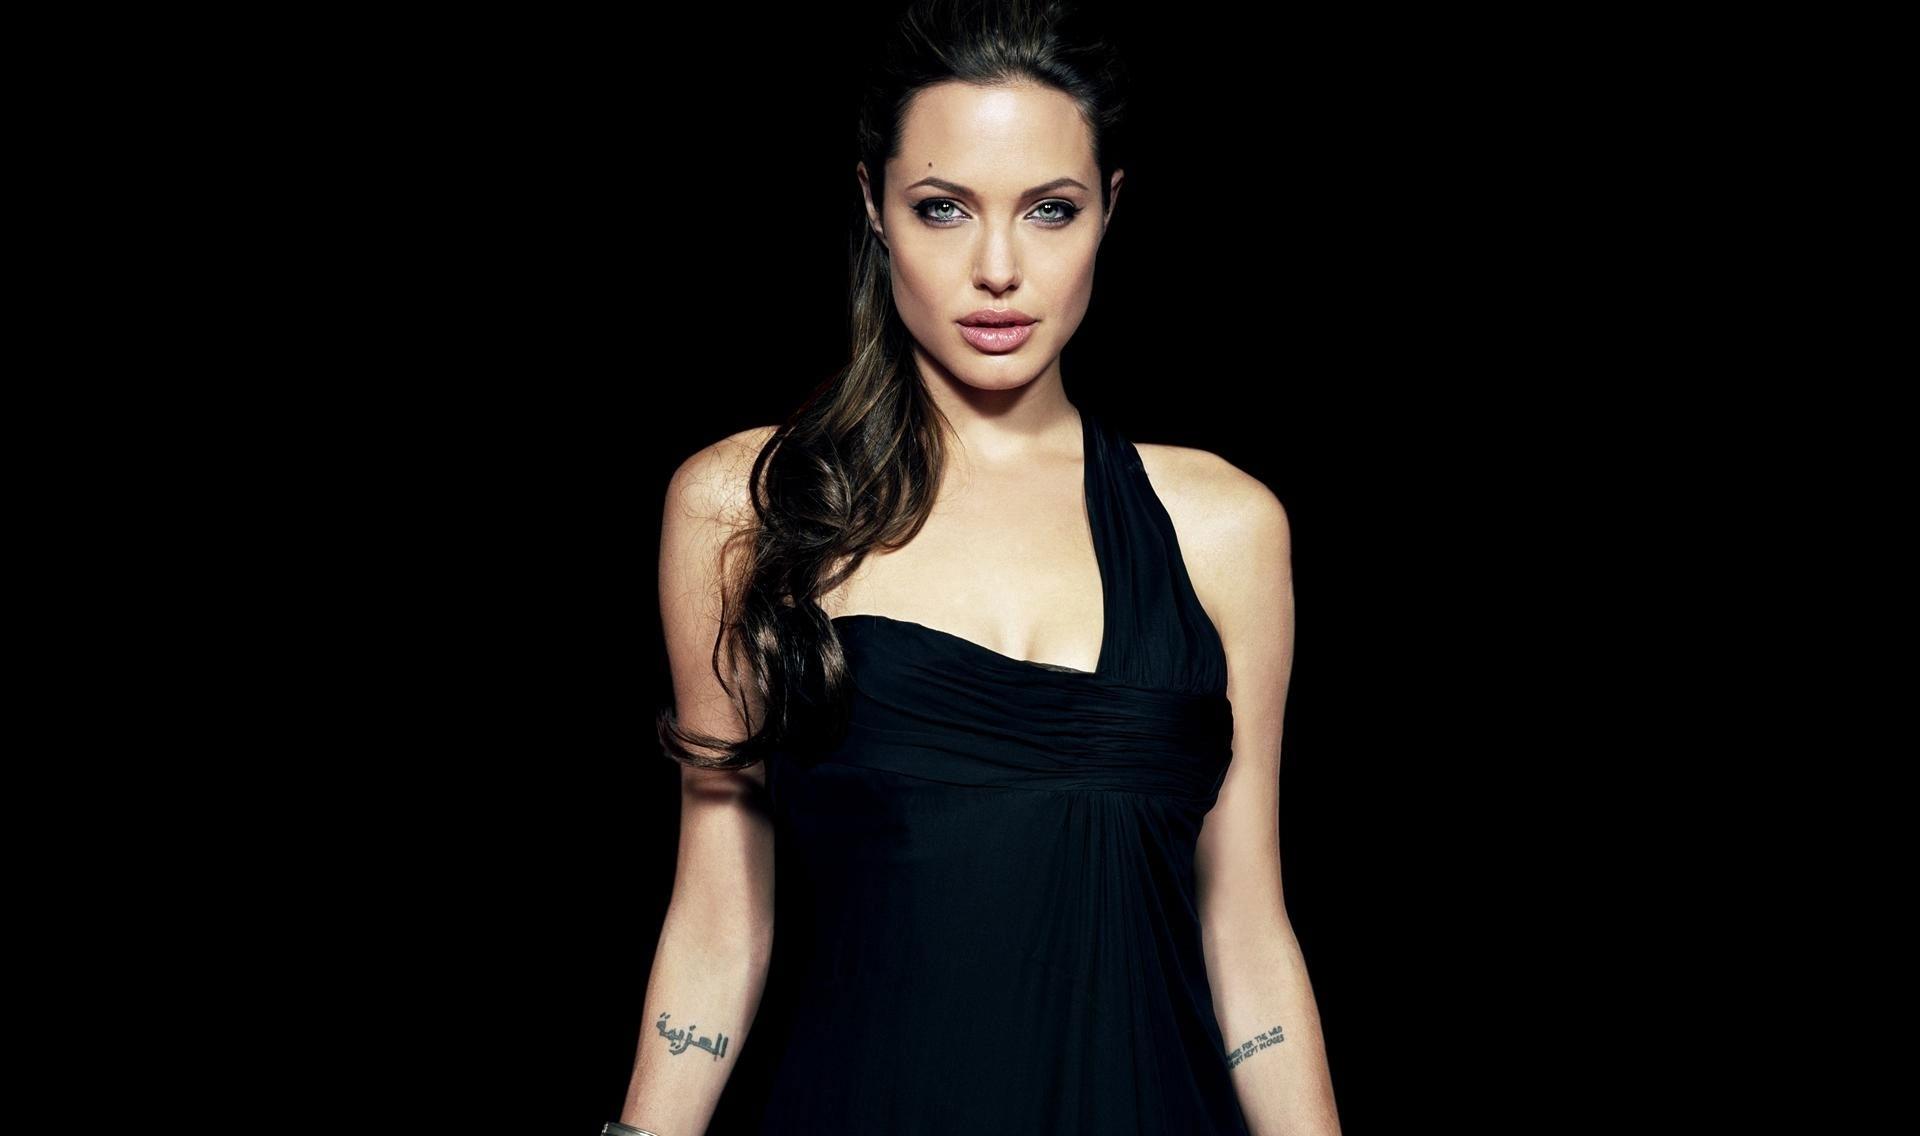 Angelina-Jolie-wallpaper-wp5602914